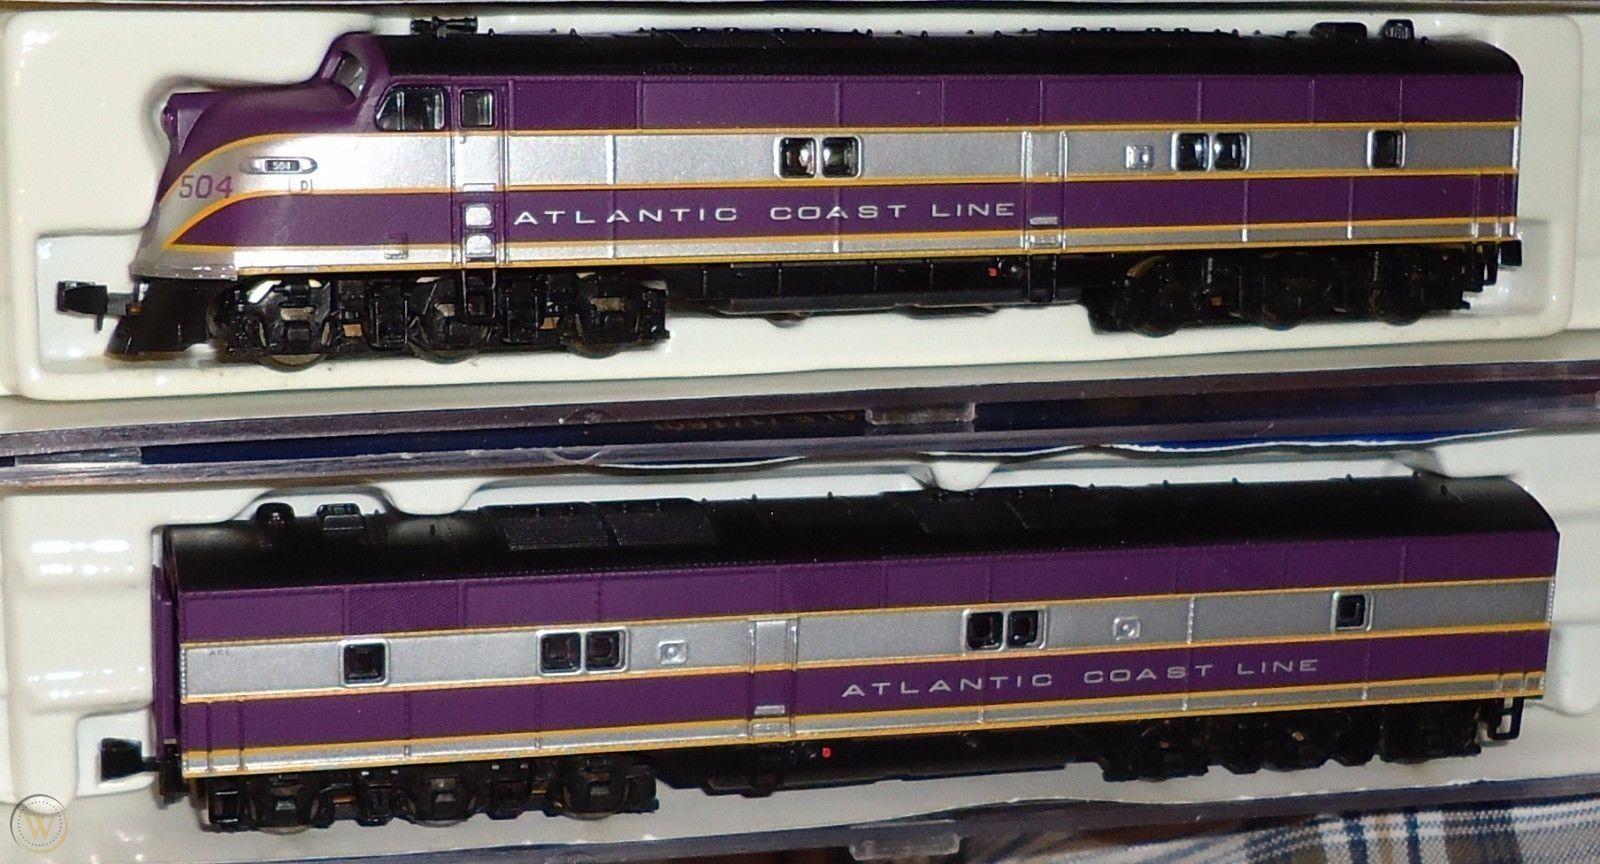 N Scale - Life-Like - 7344 - Locomotive, Diesel, EMD E6 - Atlantic Coast Line - 504, 750B